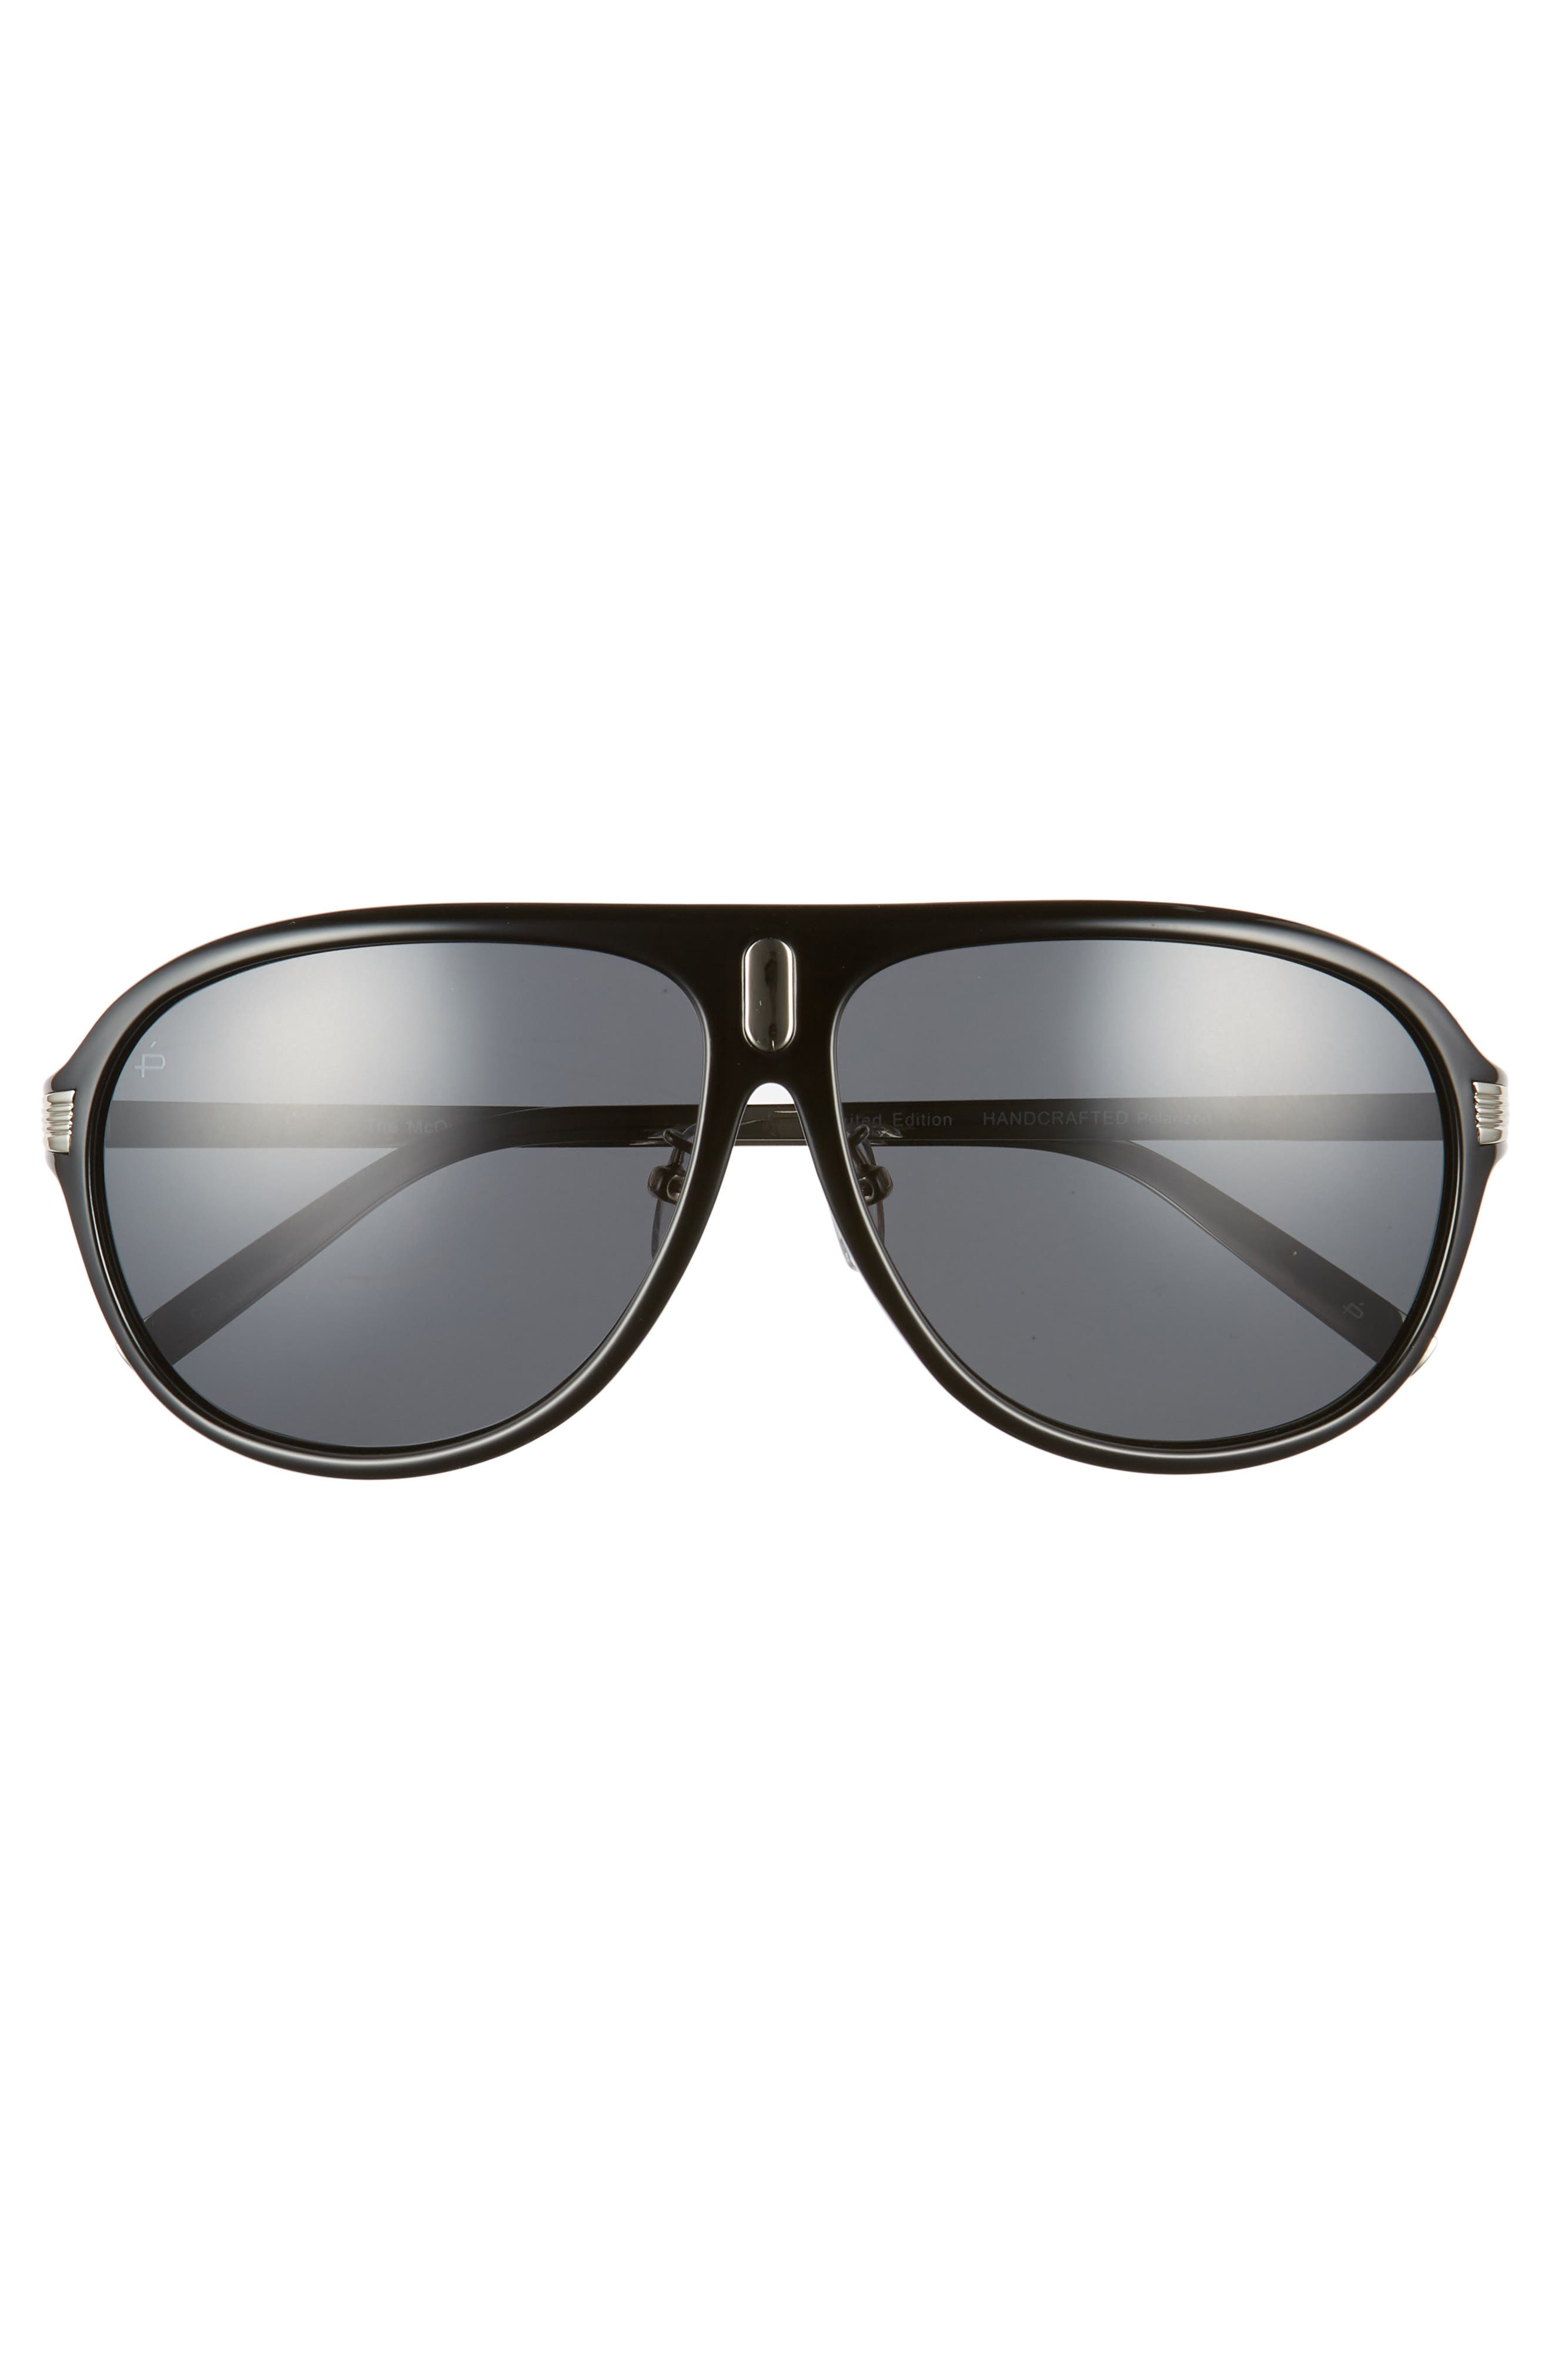 Privé Revaux The McQueen 62mm Polarized Aviator Sunglasses,                             Alternate thumbnail 2, color,                             001